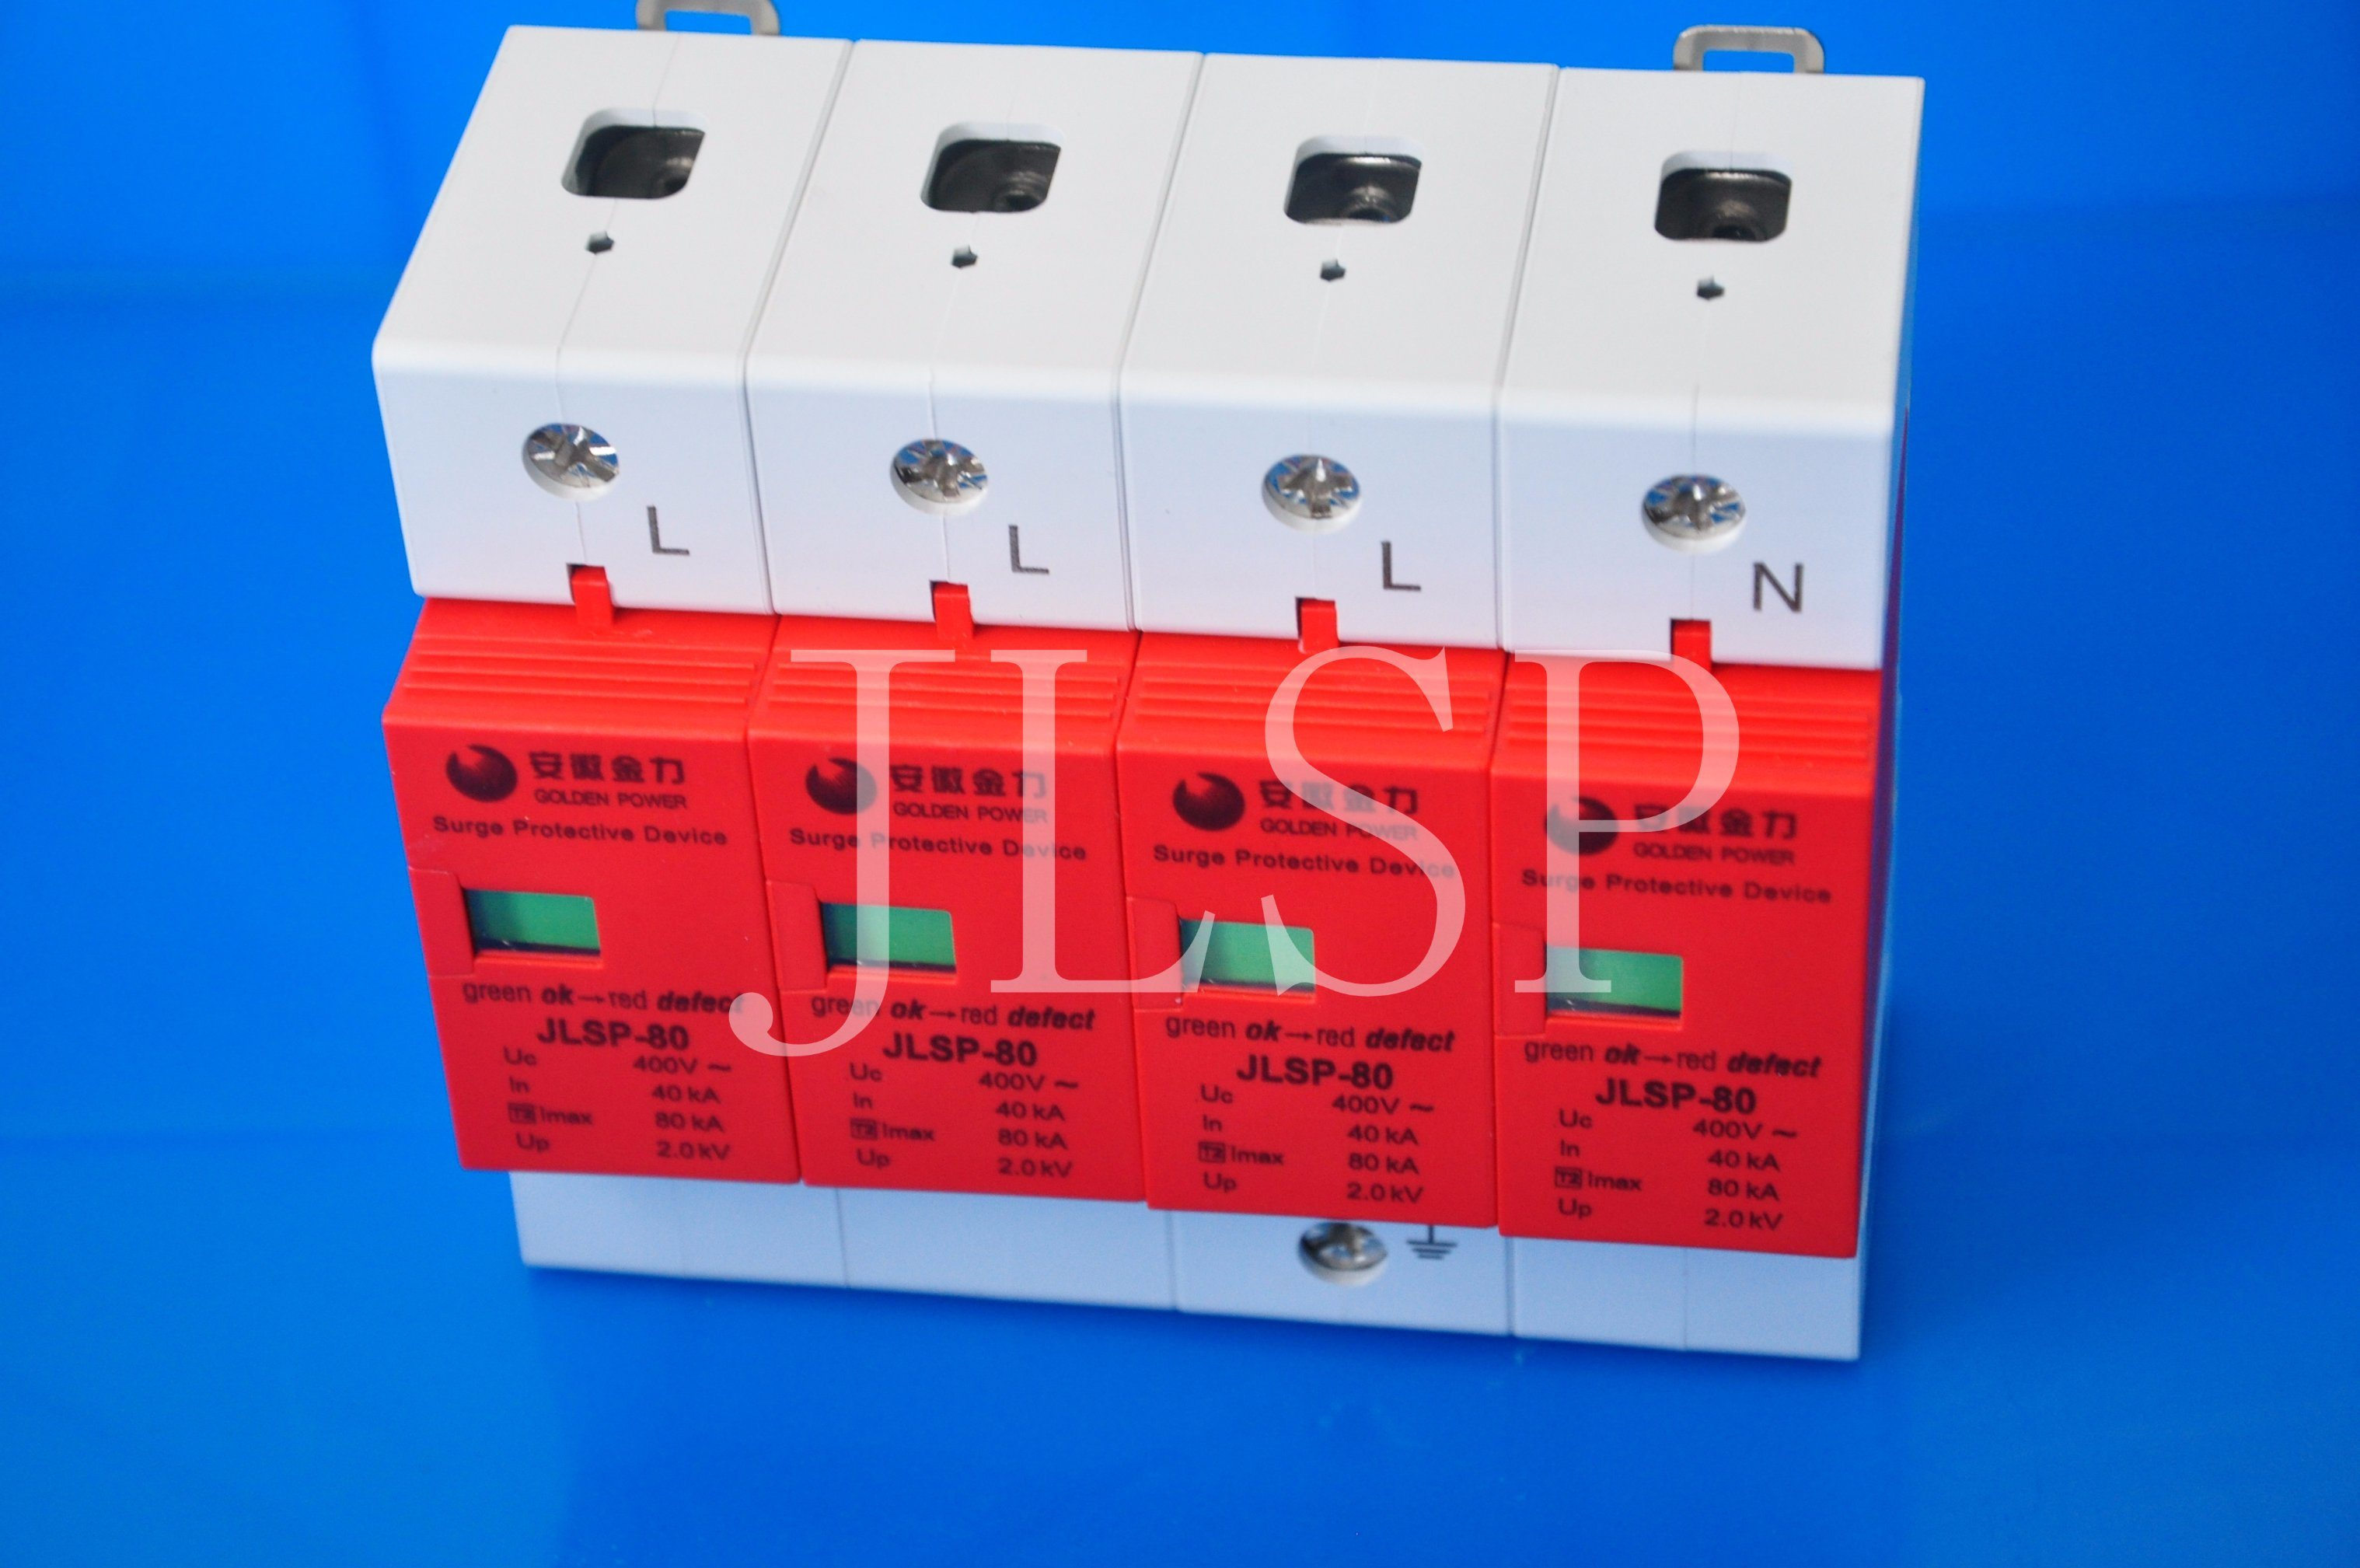 Surge Protective Device 20ka 230/400V, Jlsp-400-80, SPD, 80-008